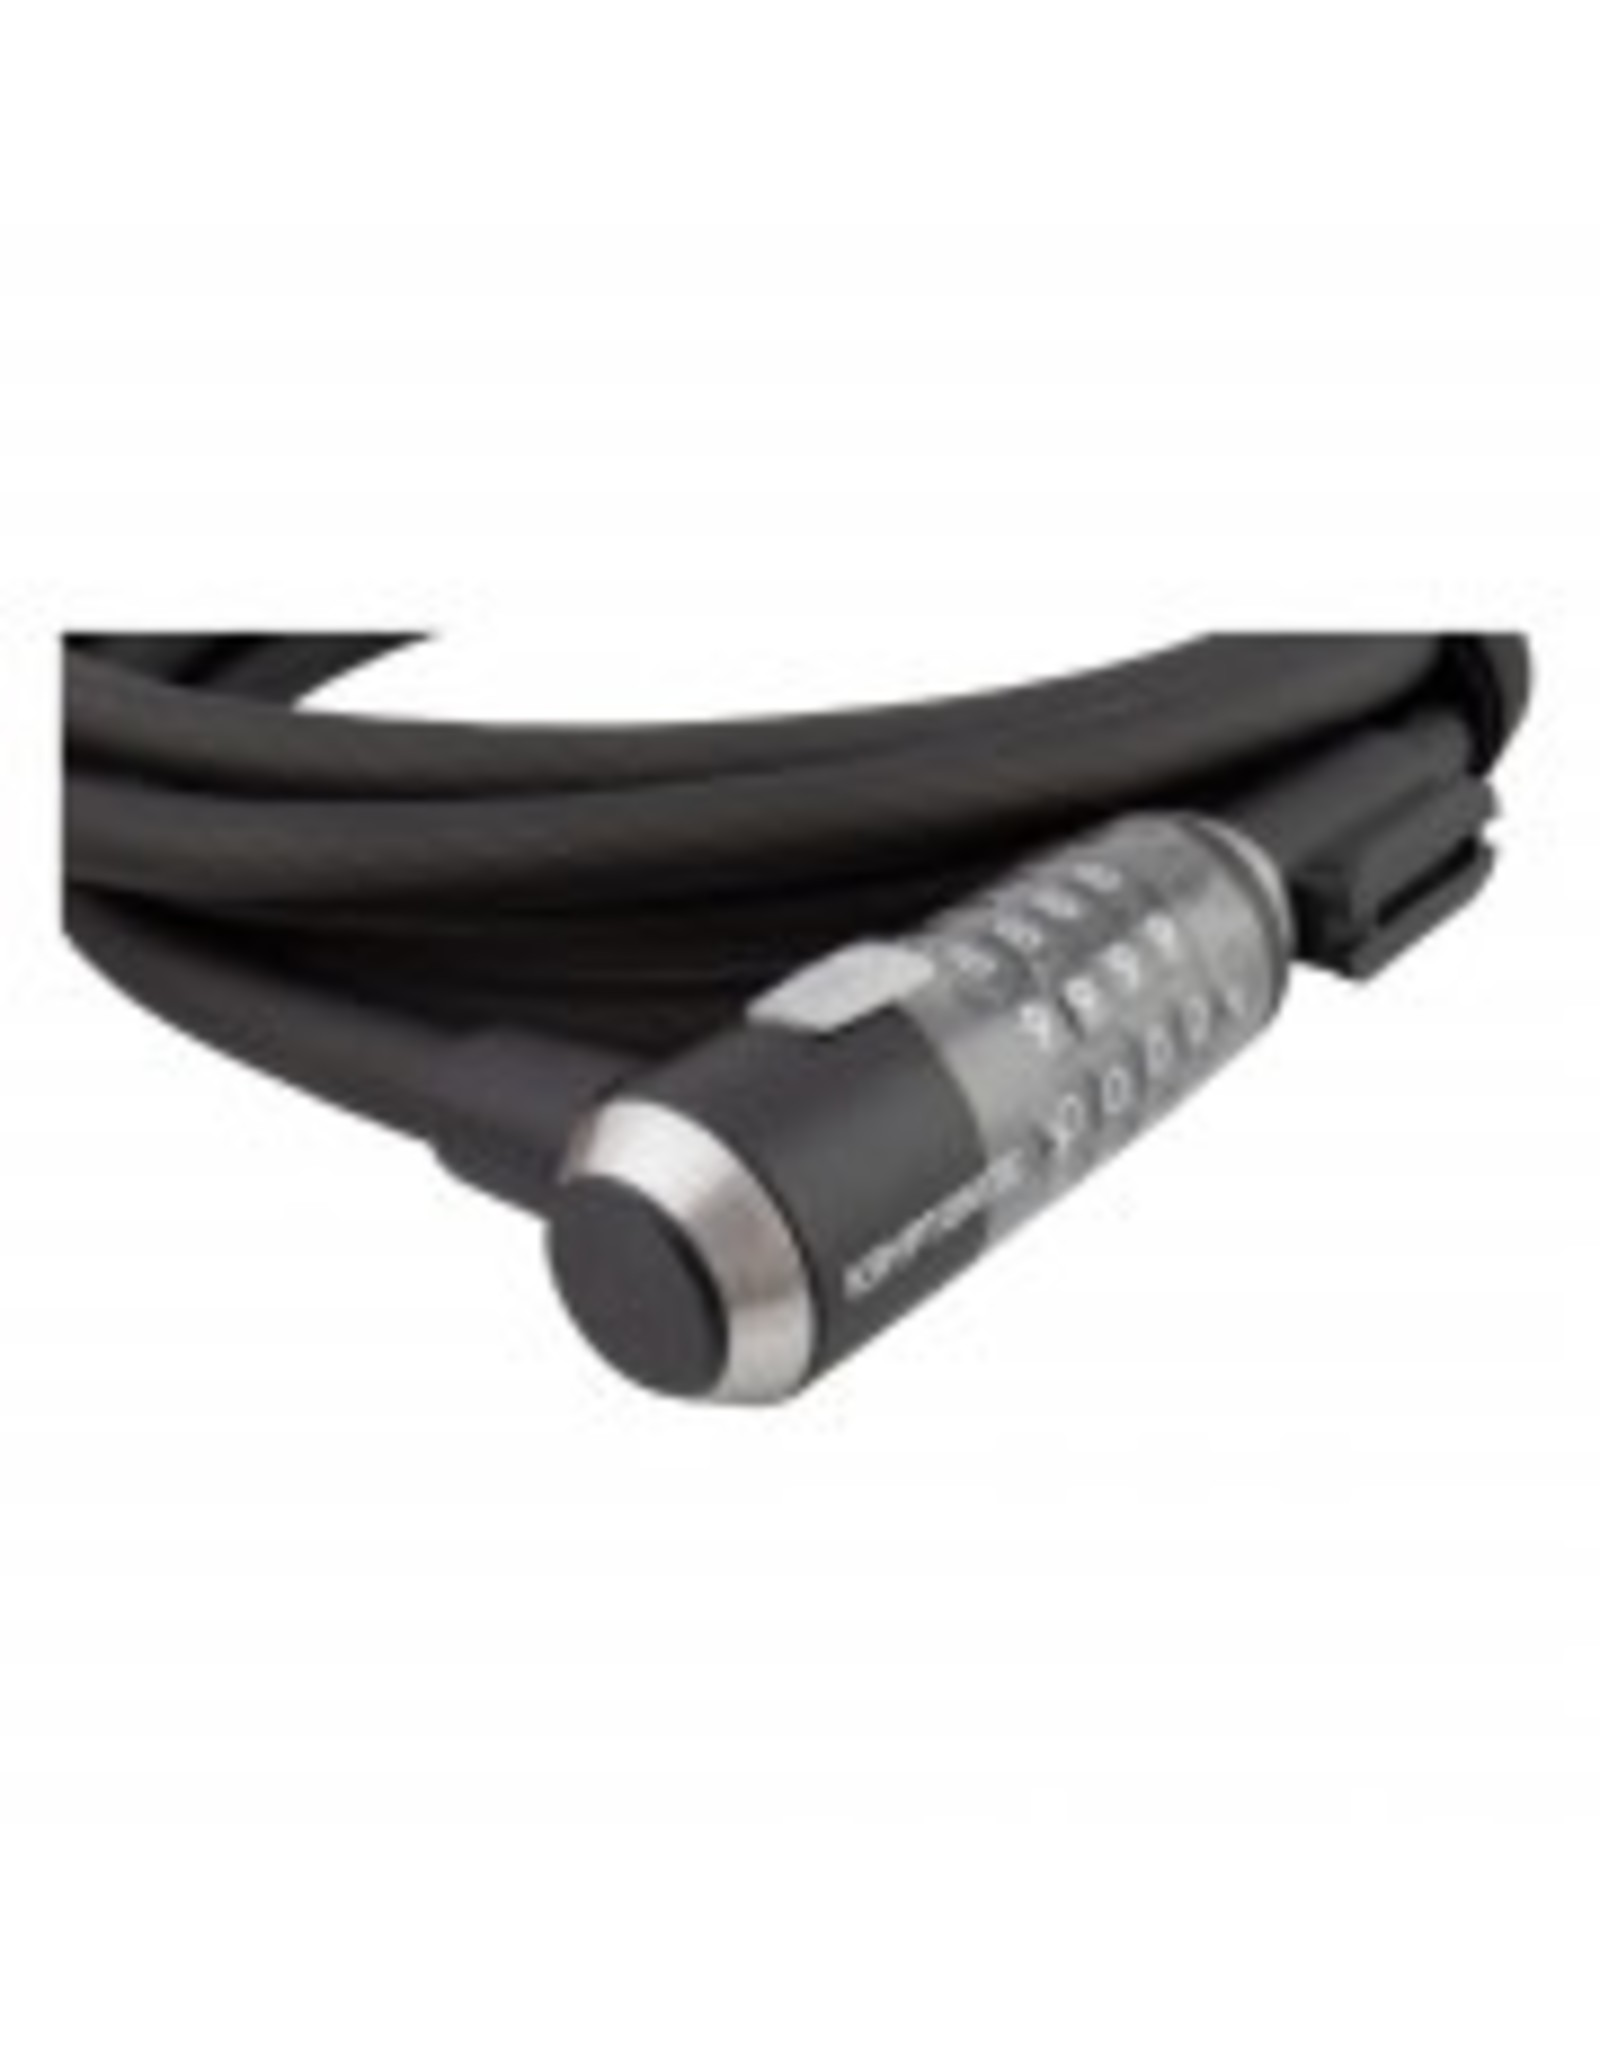 KRYPTONITE KryptoFlex 1230 Cable Combination Lock